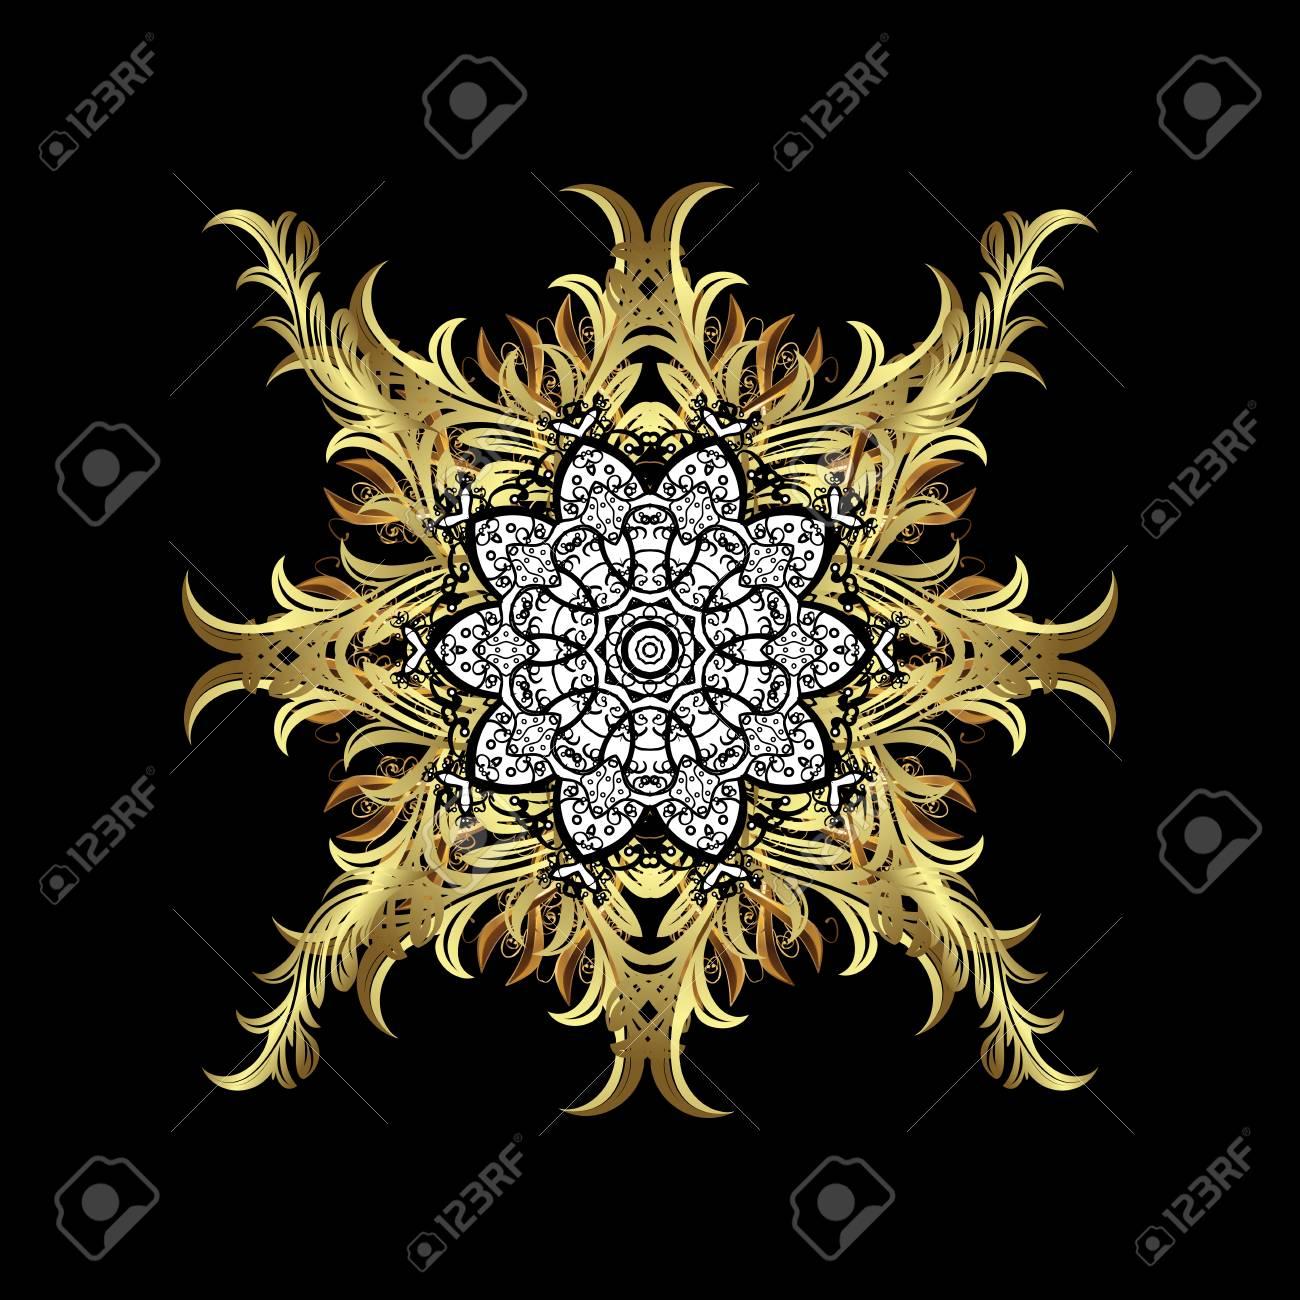 Pattern On Black Background With Golden Elements Golden Mehndi